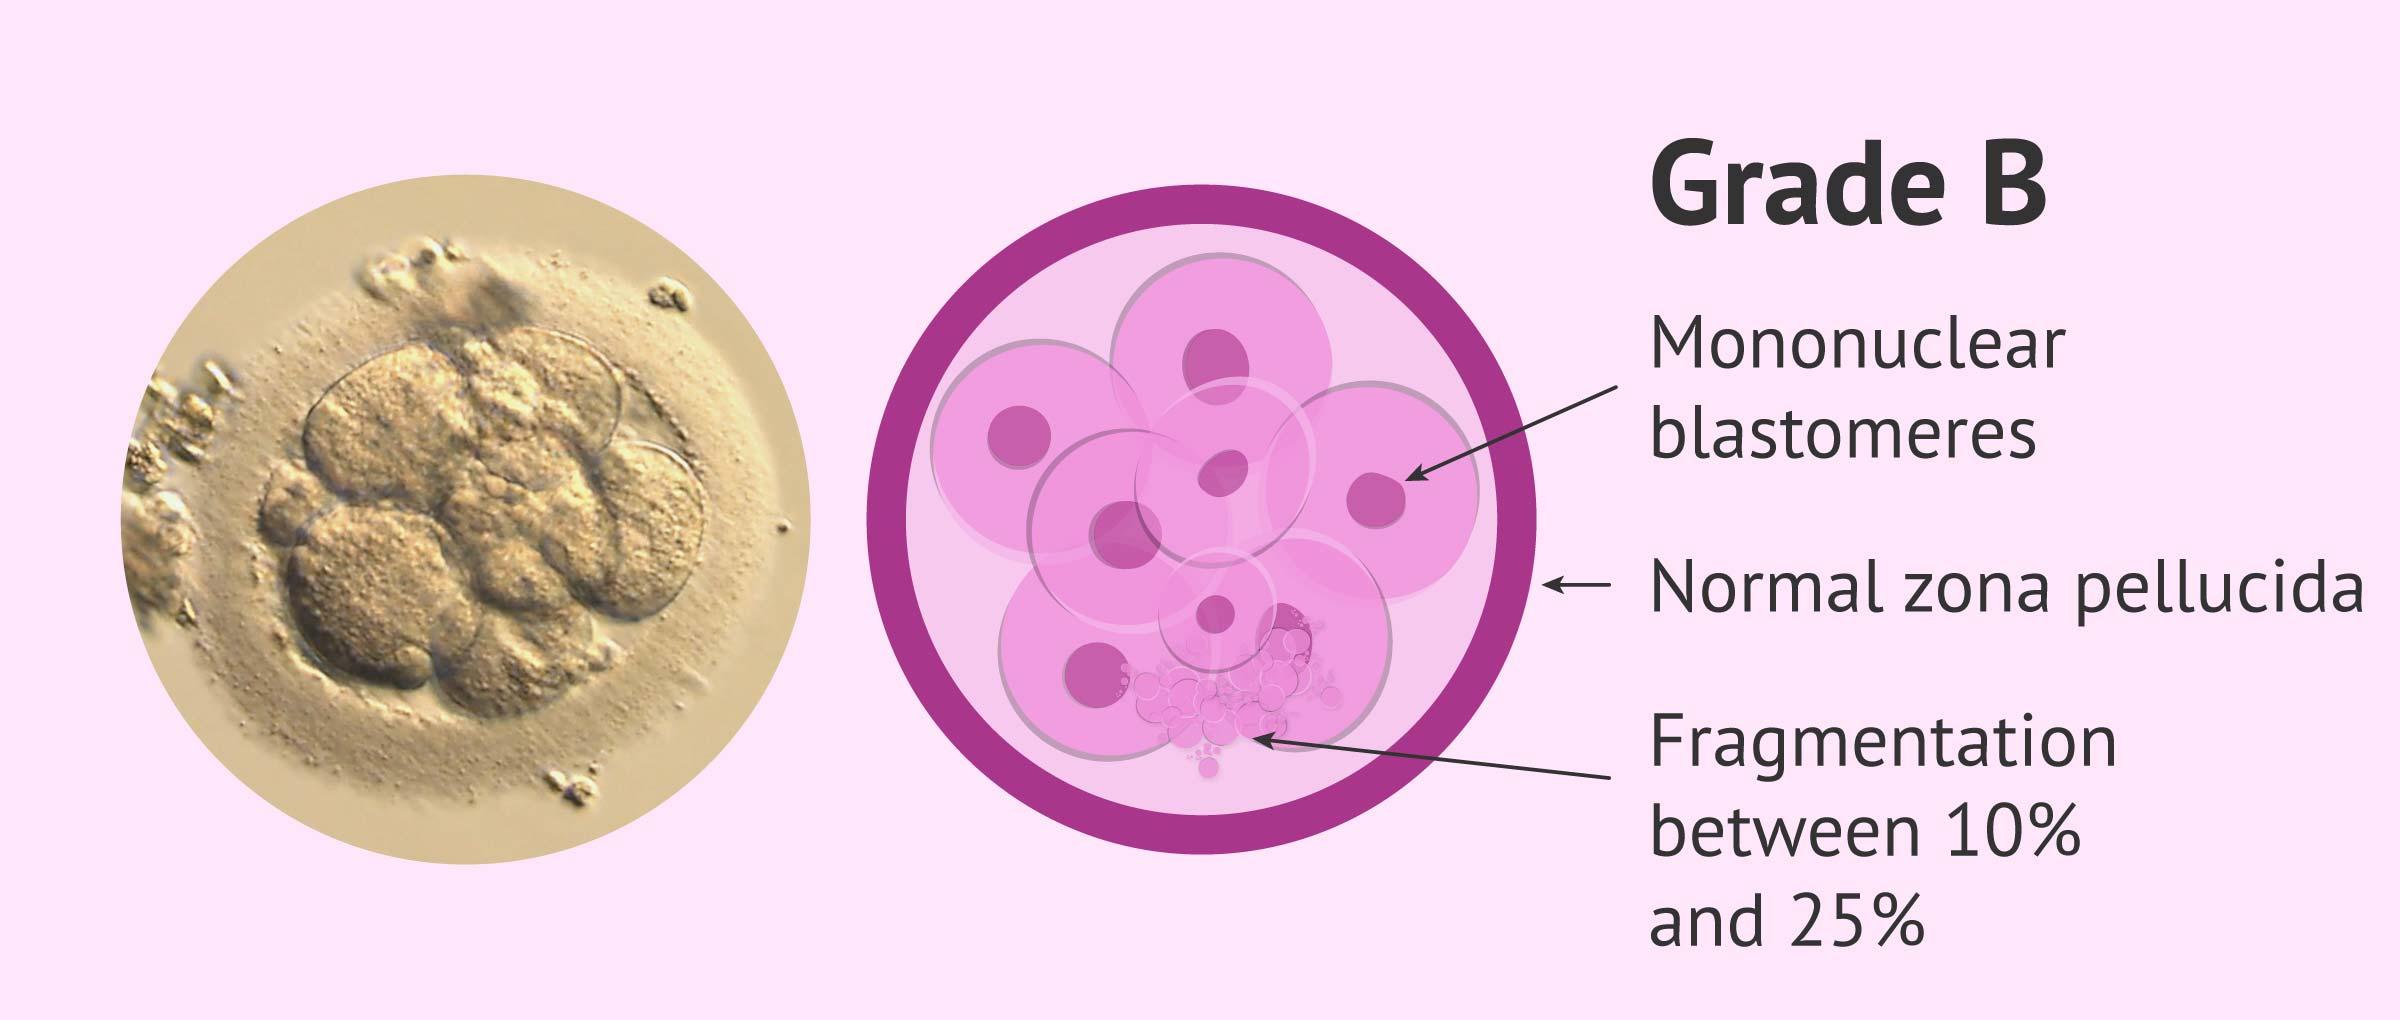 Imagen: Grade B Embryo